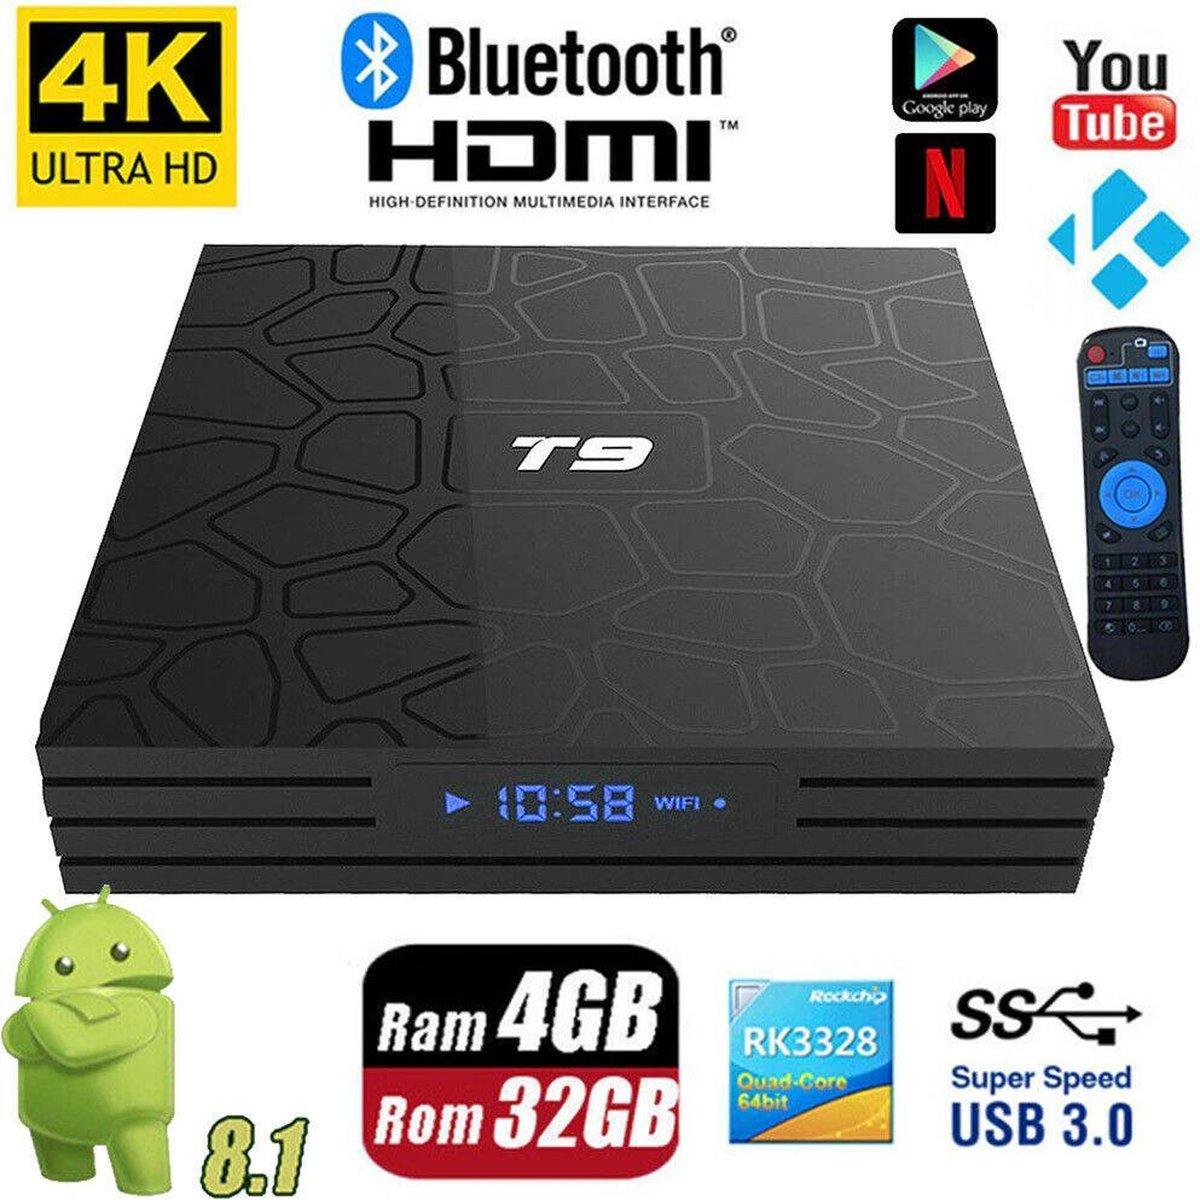 DrPhone AT9 – Android 9.0 TV Box – Mediaplayer – 4K Ultra HD –  4GB RAM – 32GB Opslag – Bluetooth 4.0 Quad-Core – Netflix / Wifi – Maakt TV Slim